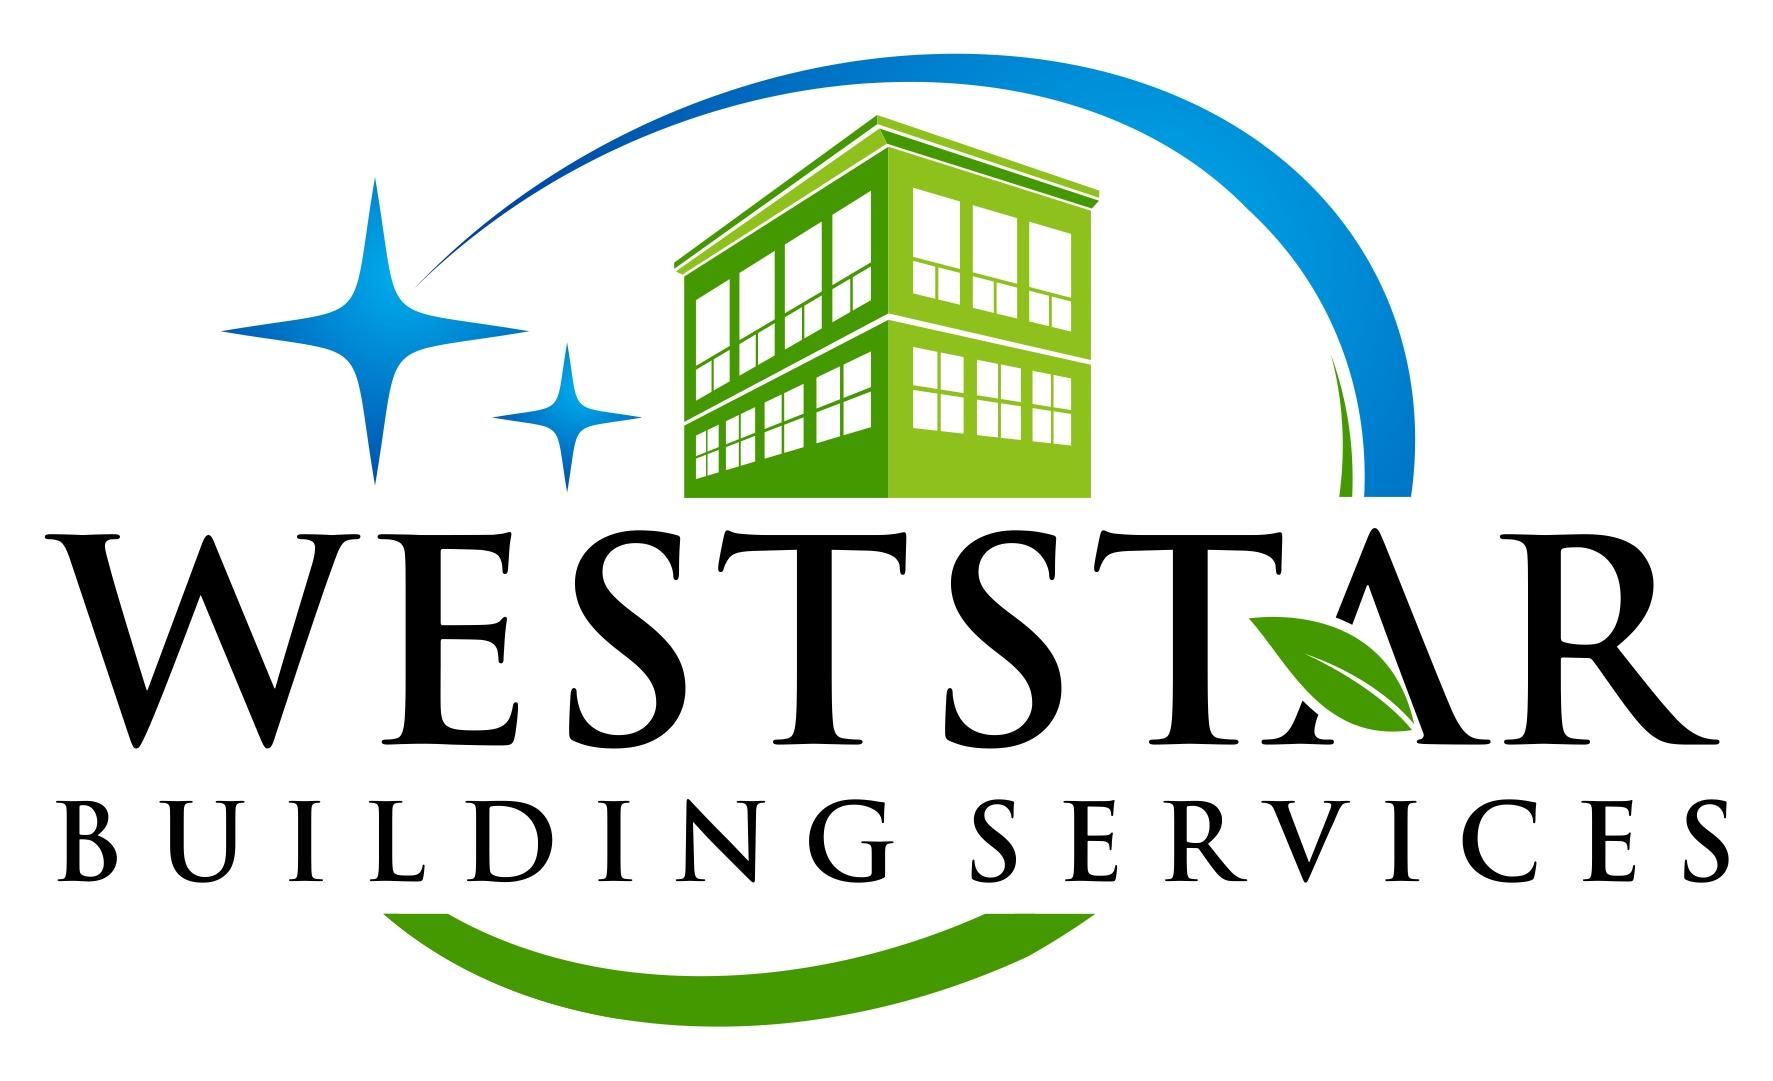 WestStar Building Services